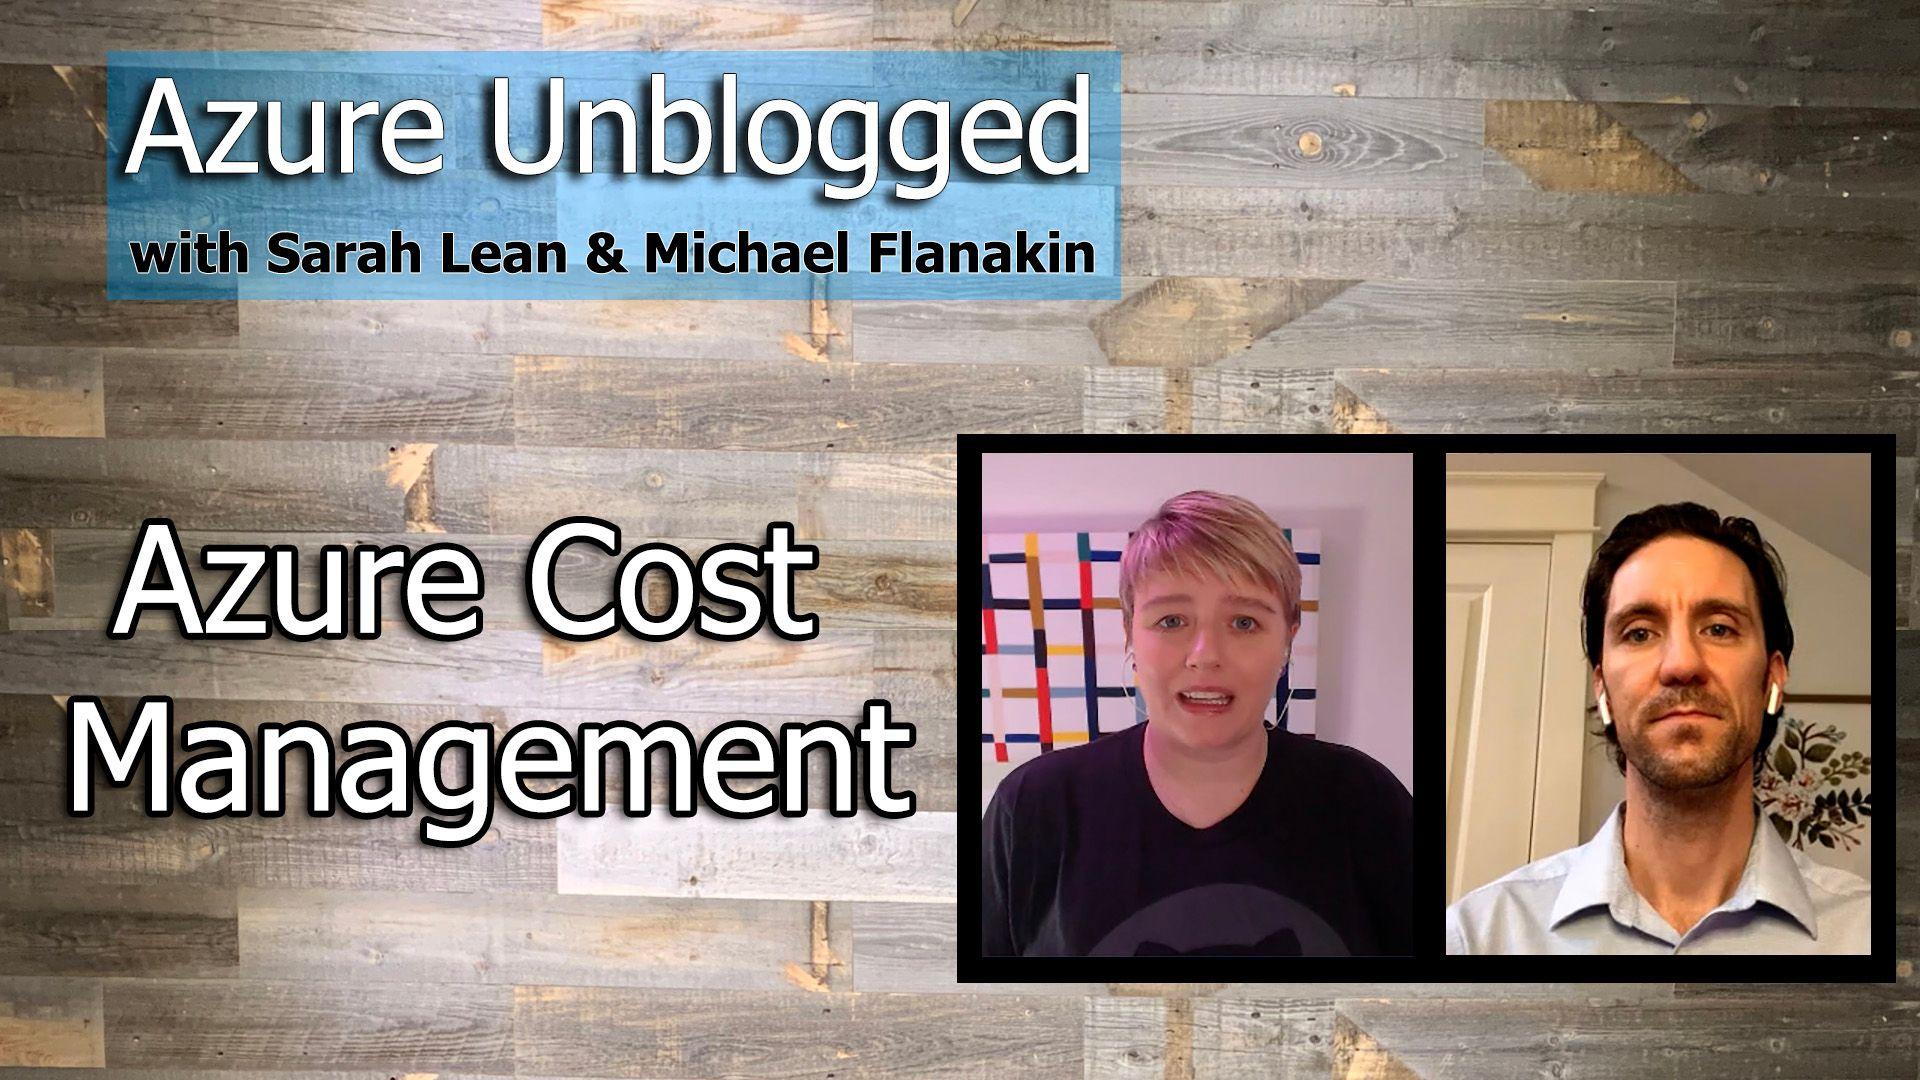 Azure Unblogged - Azure Cost Management